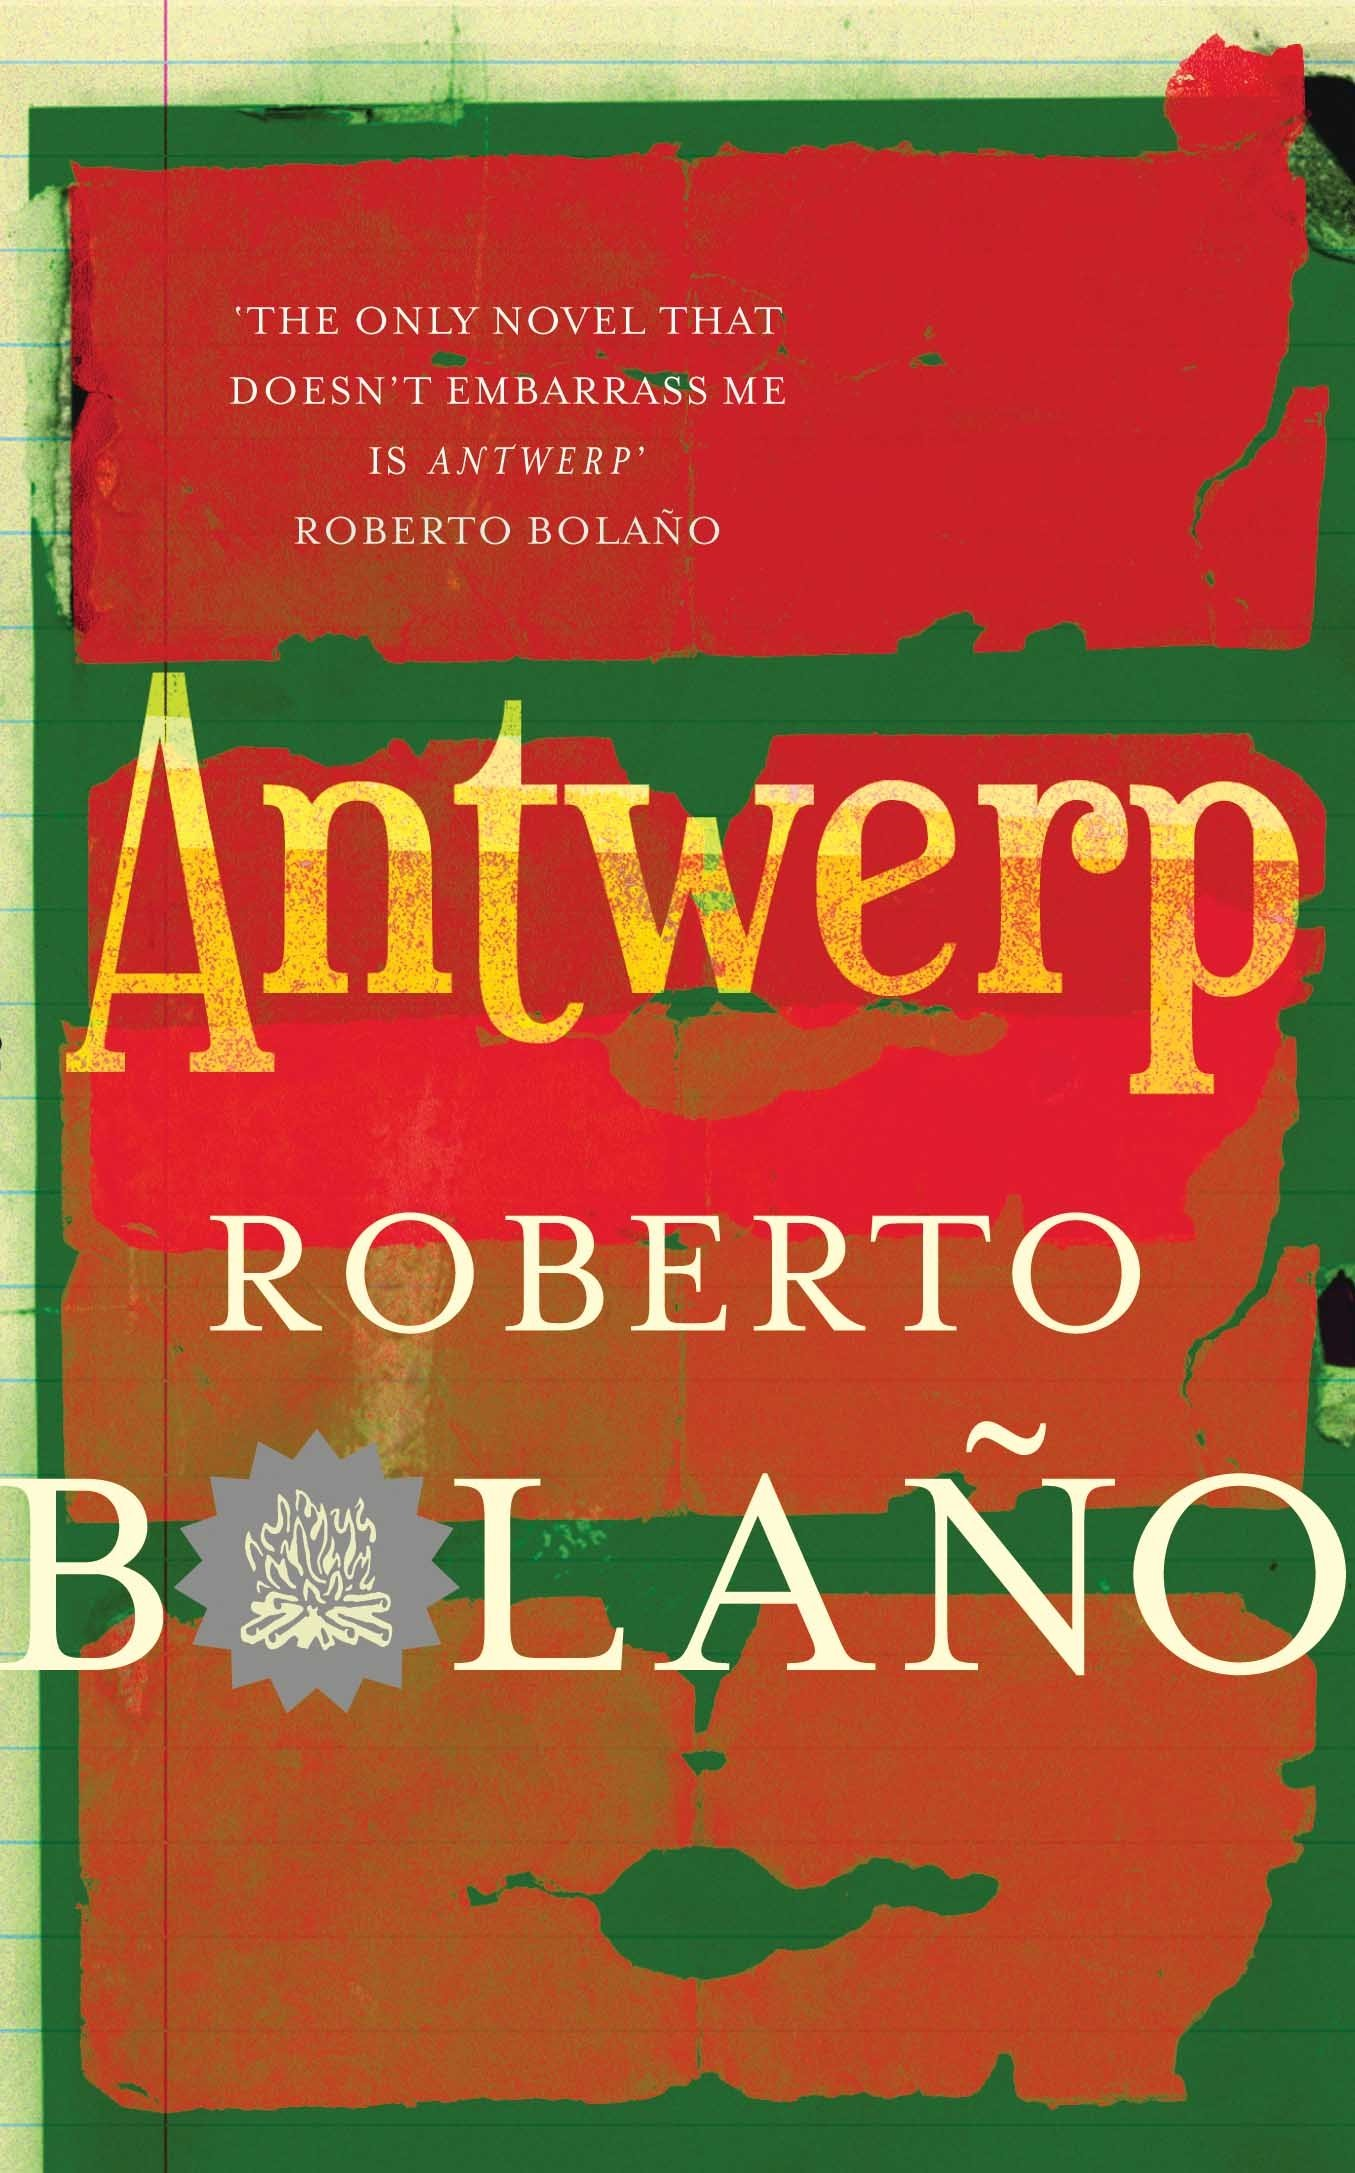 Roberto Bolano - Antwerp (2002)